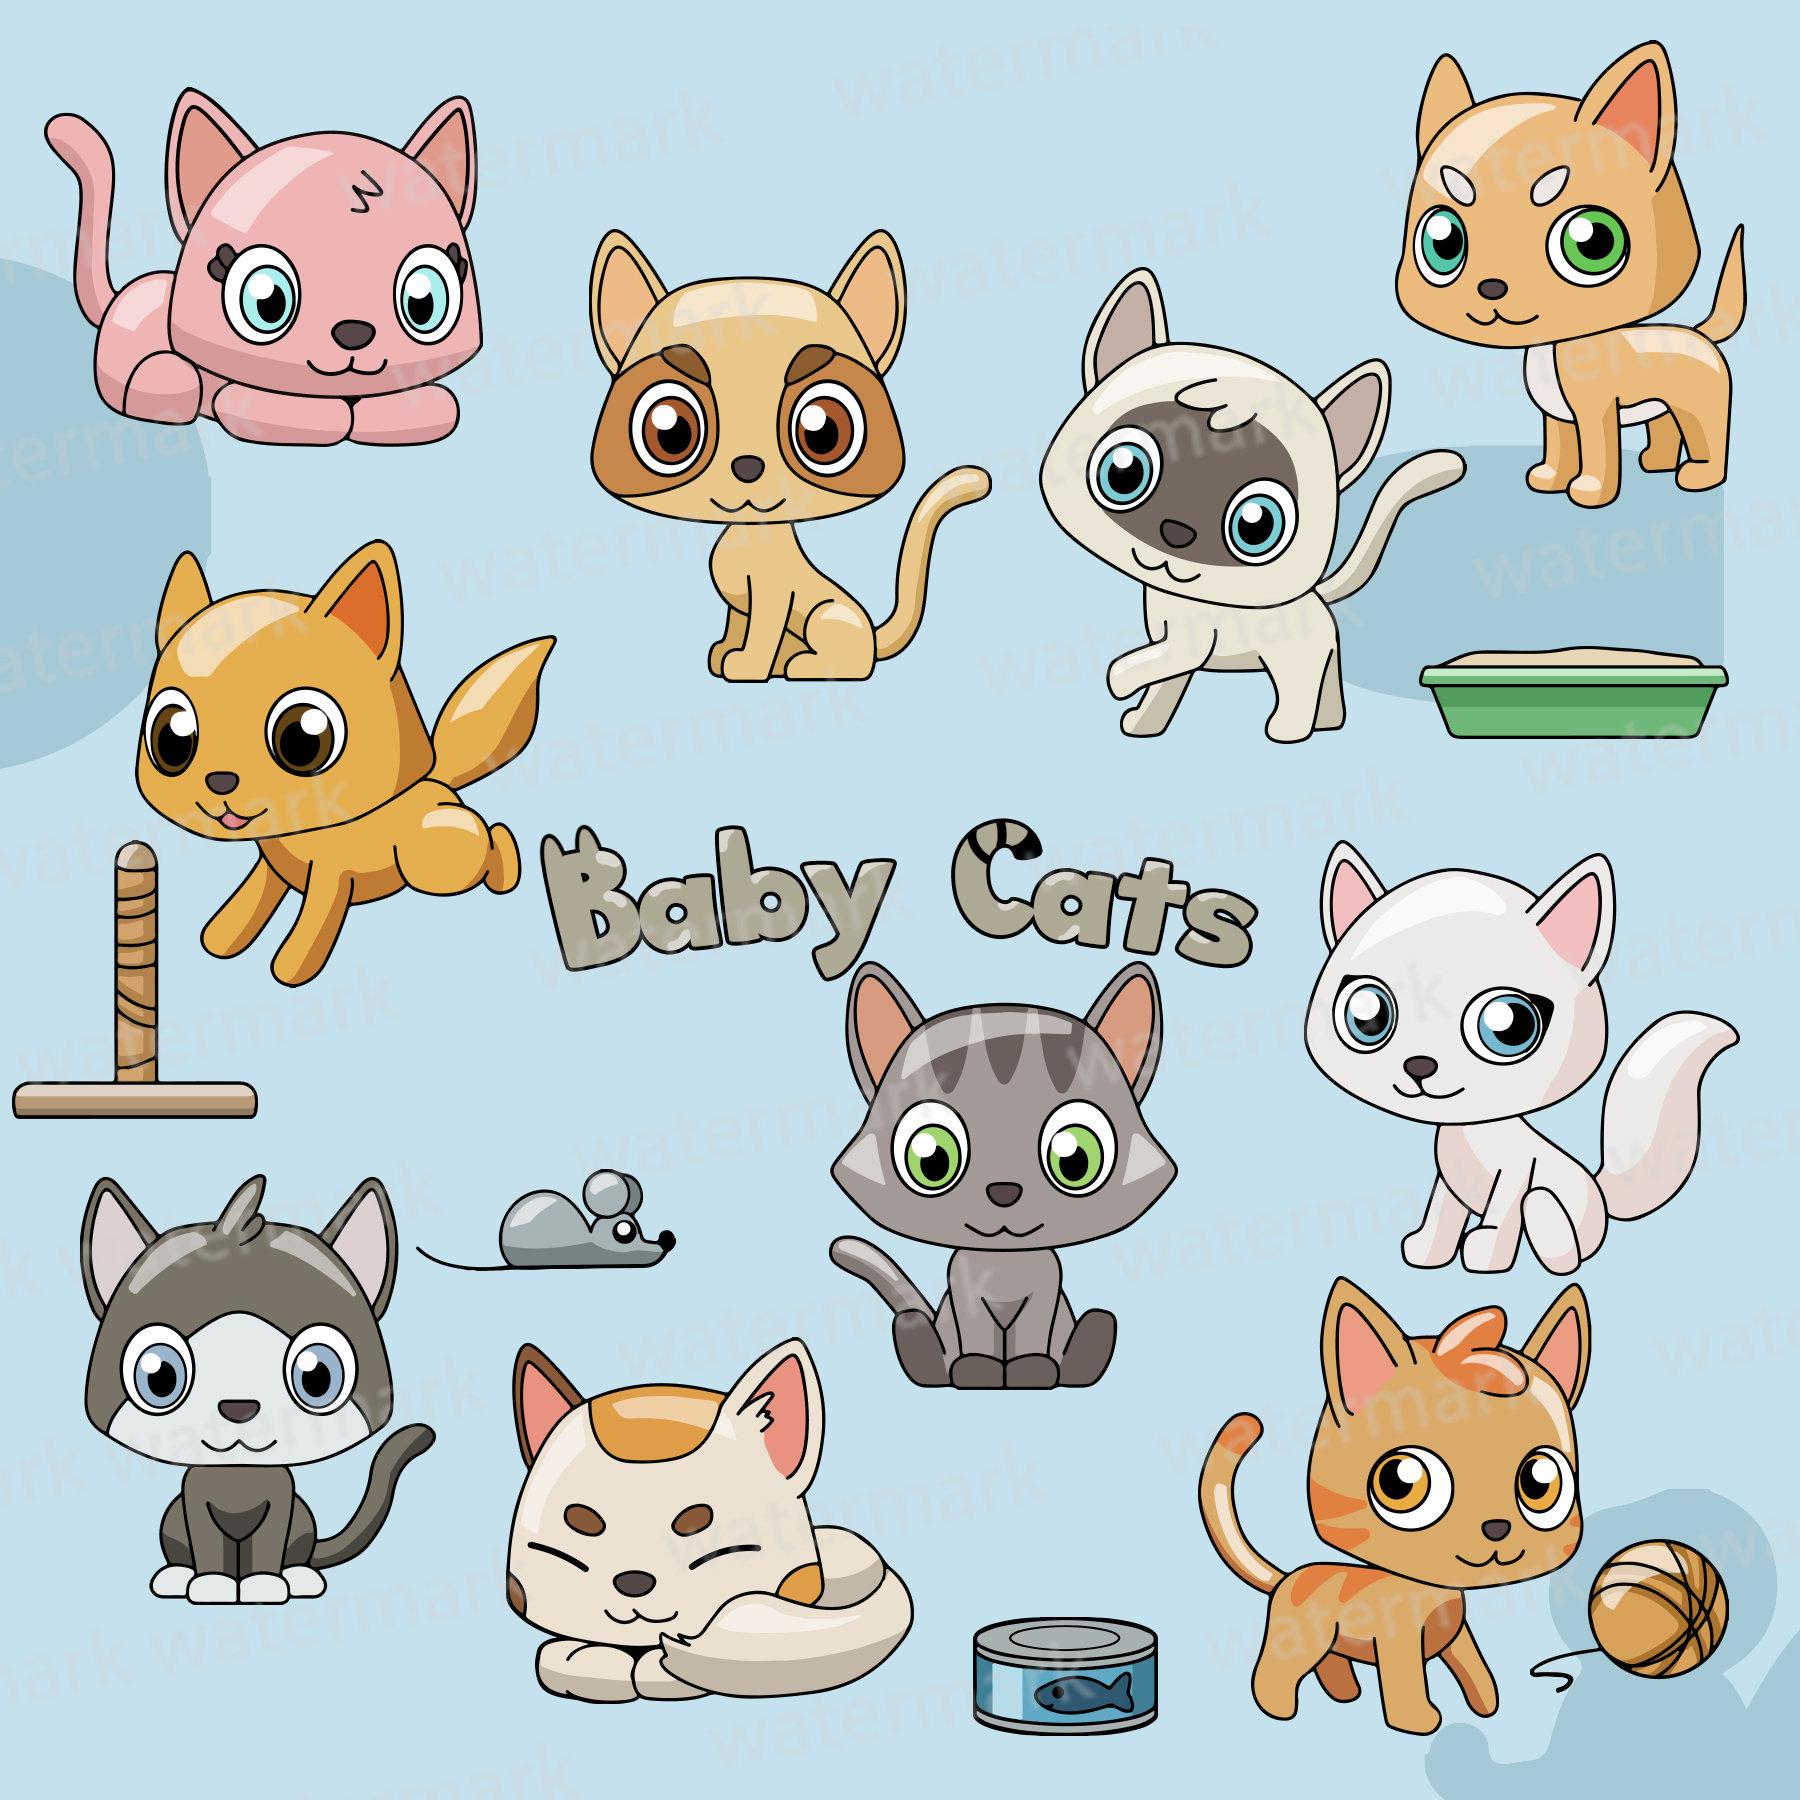 Cat Clipart, cats clipart, kitten clipart, kittens clipart, clipart, clip  art, cute cats clipart, cats, kittens, cat, kitten, pets clipart.